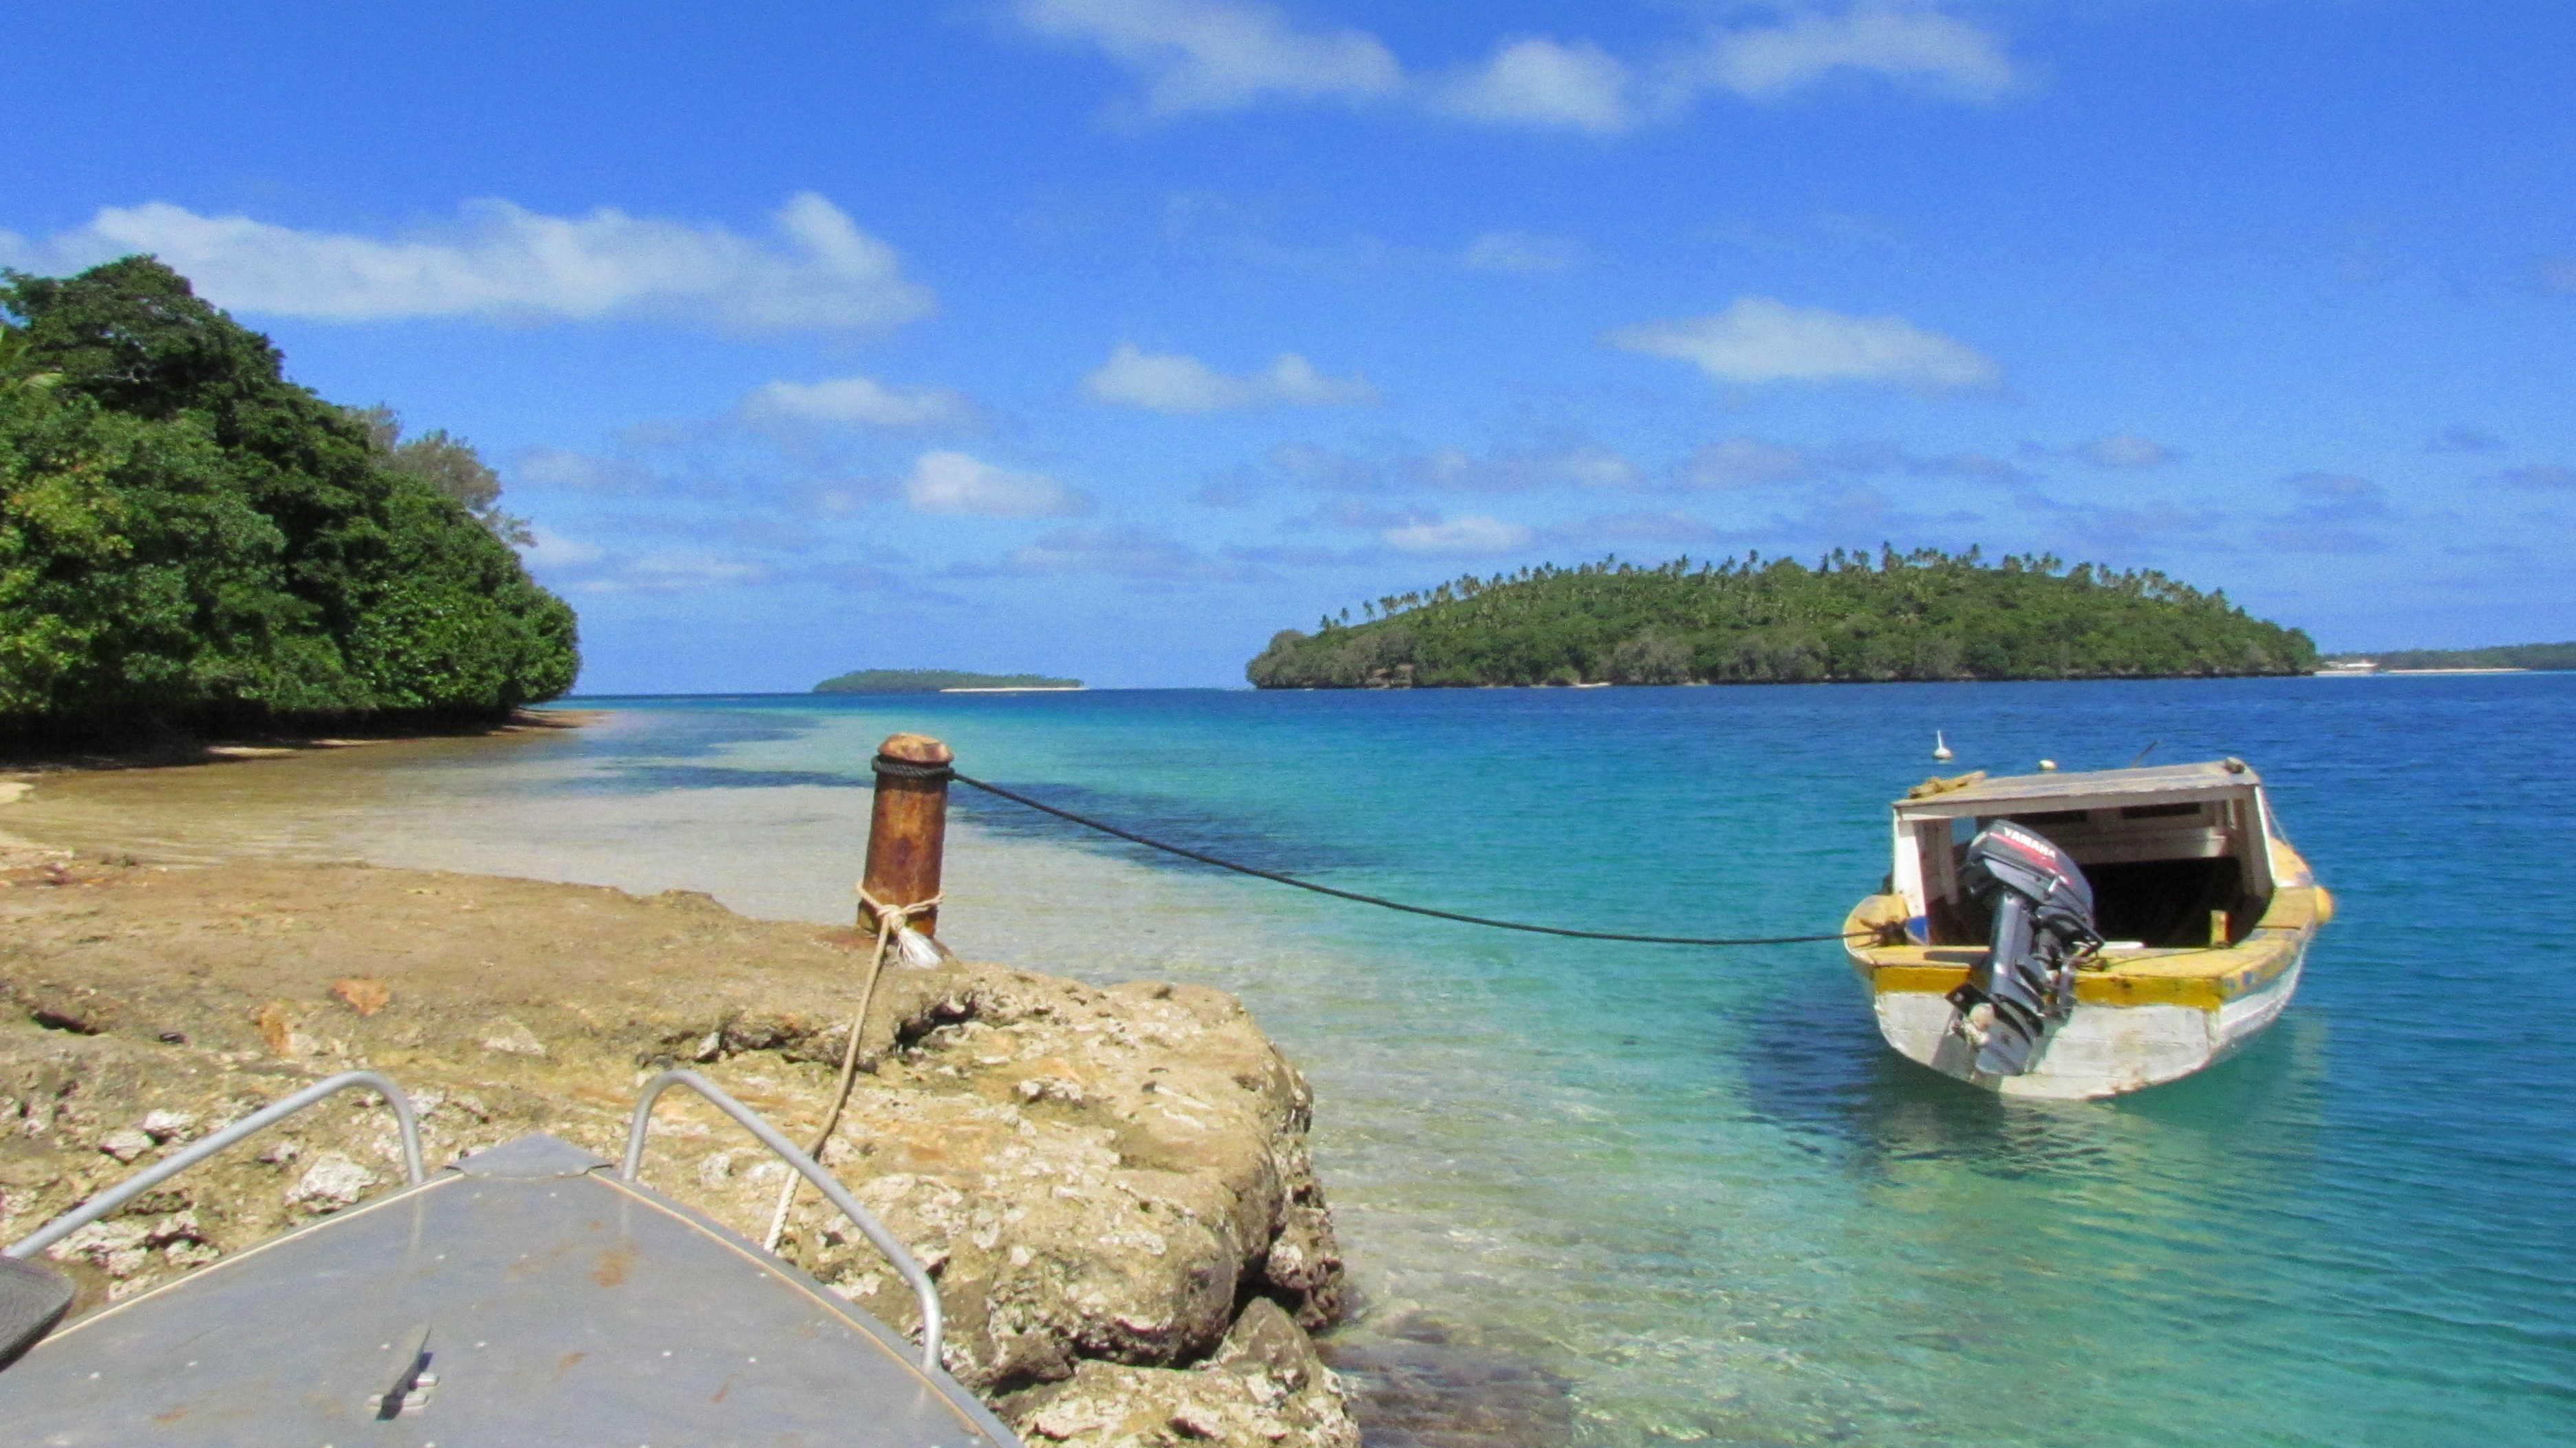 Unspoilt, idyllic Vava'u, Tonga